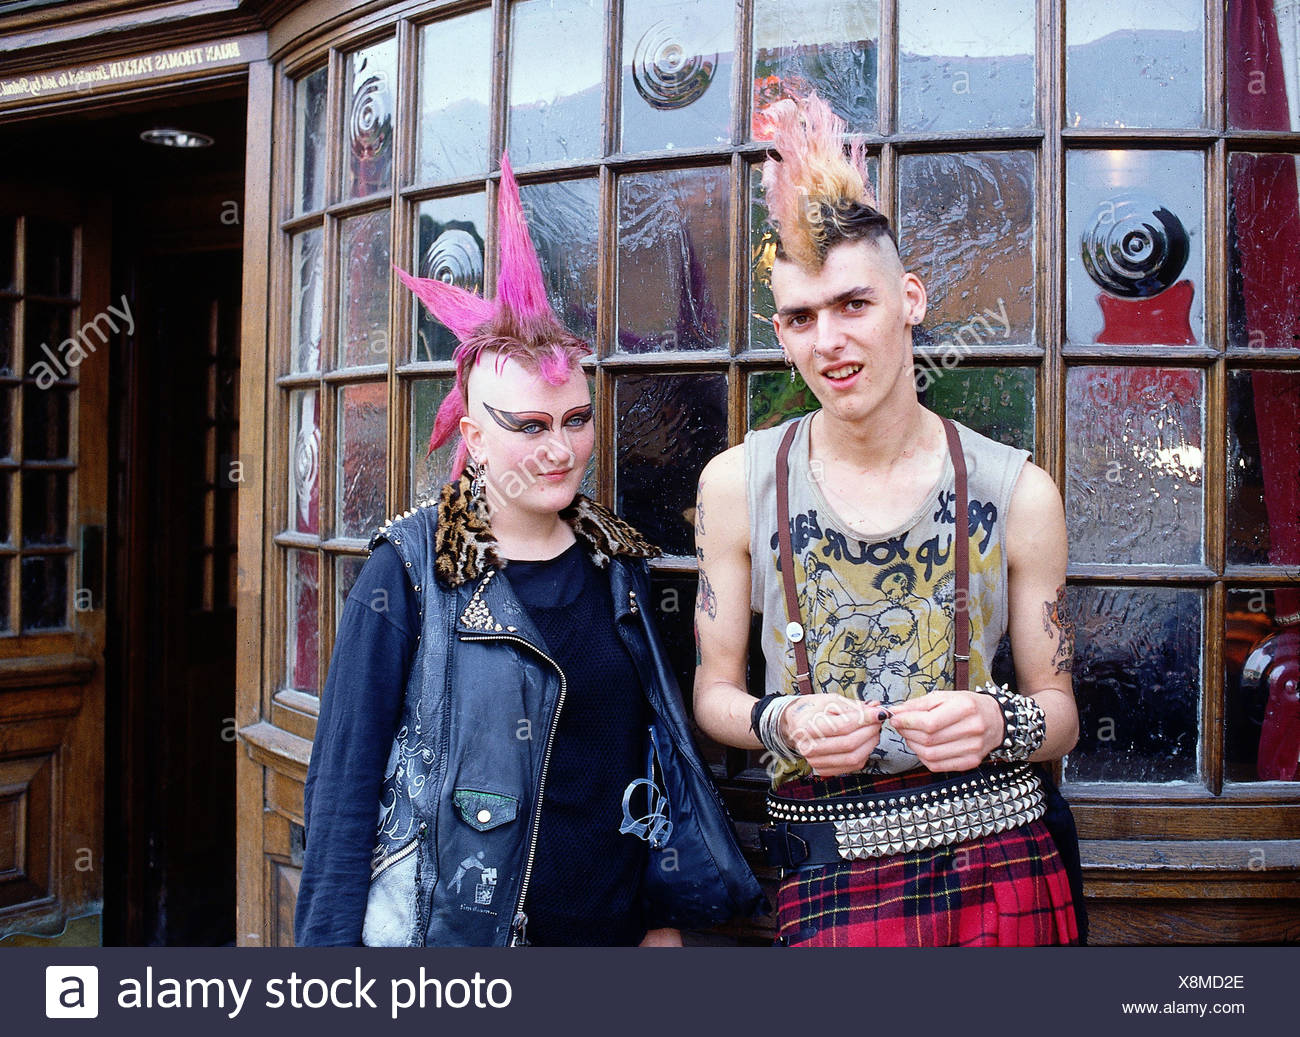 Menschen Zwei Punks Halbe Länge London Kensington Market 1980er